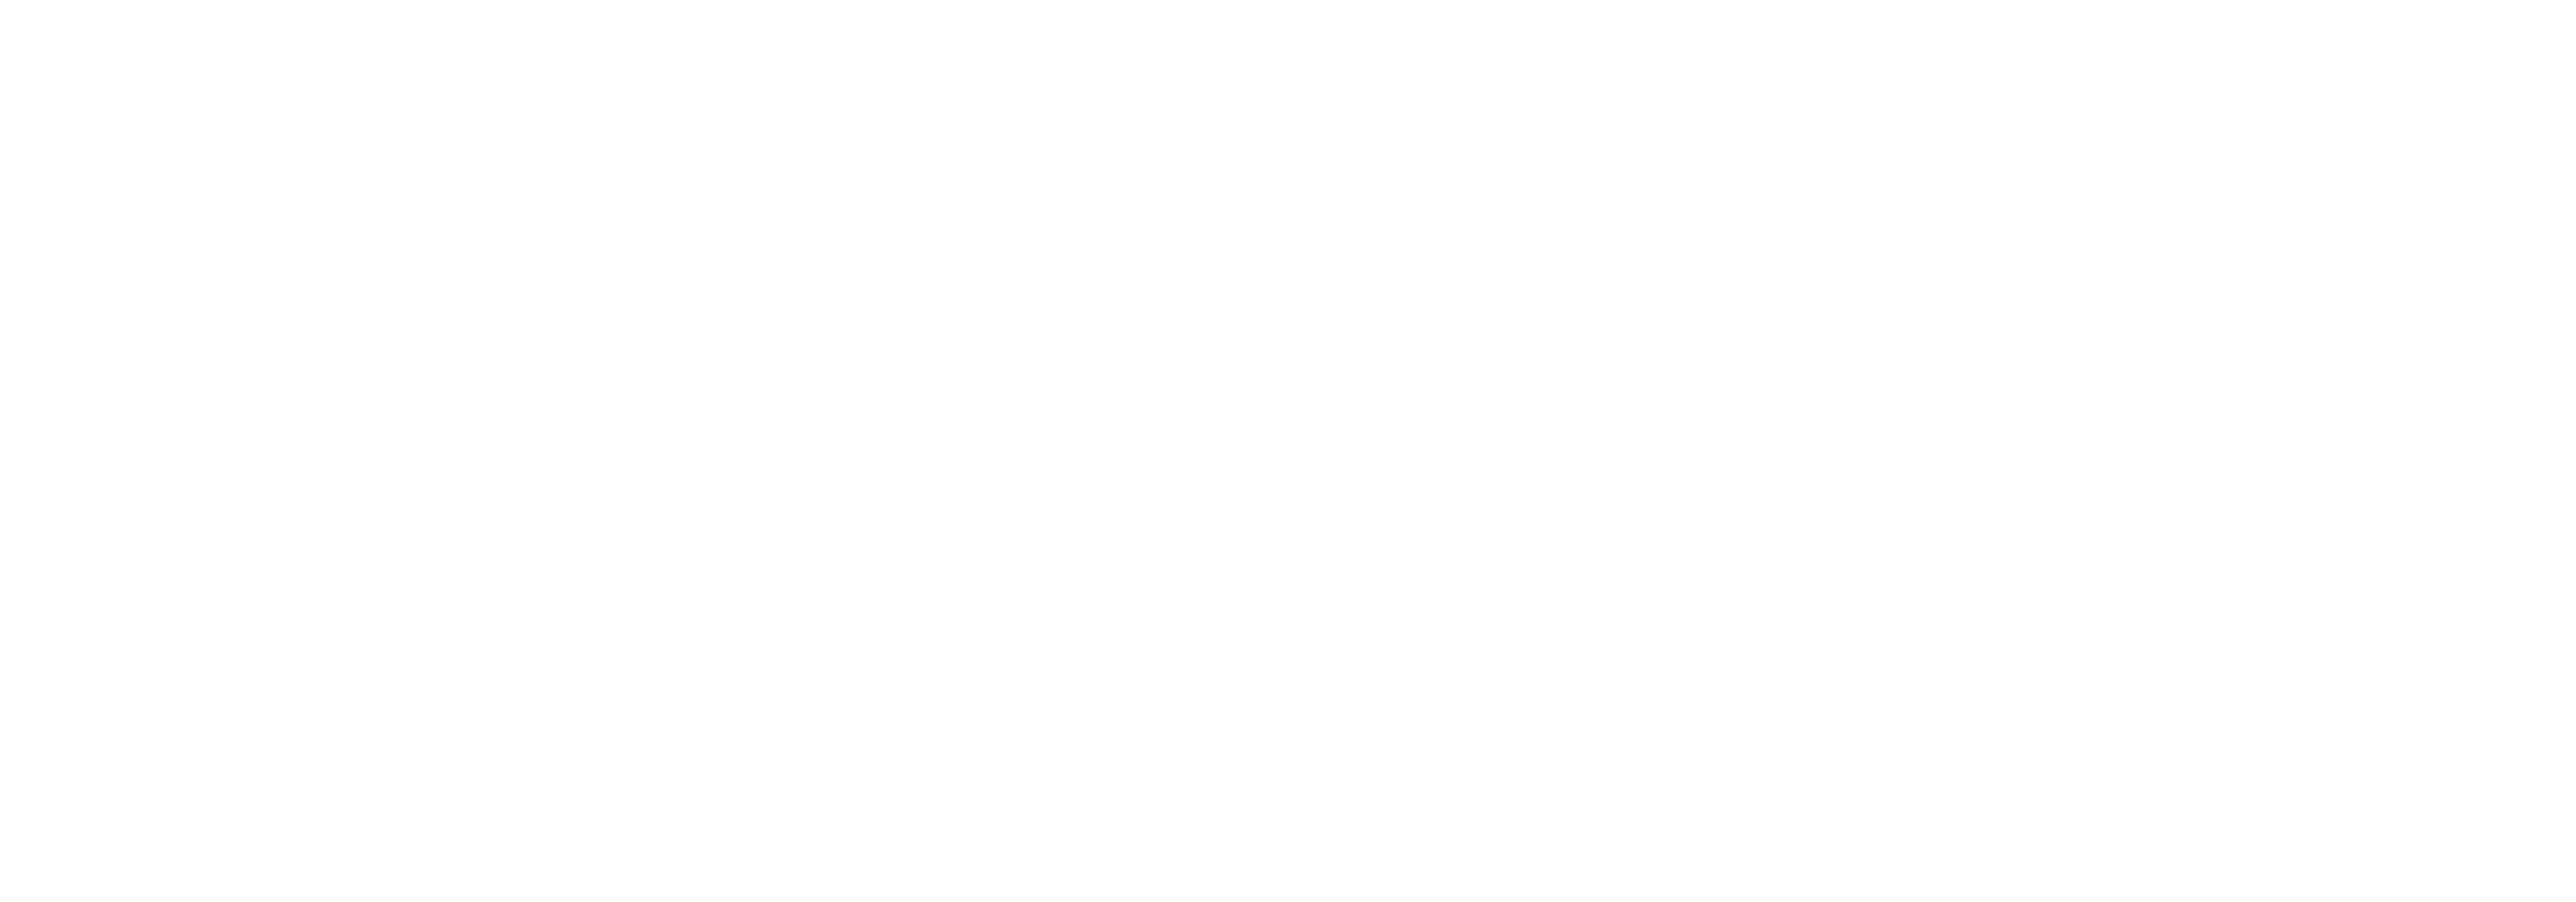 Istruzioni brewing pour-over